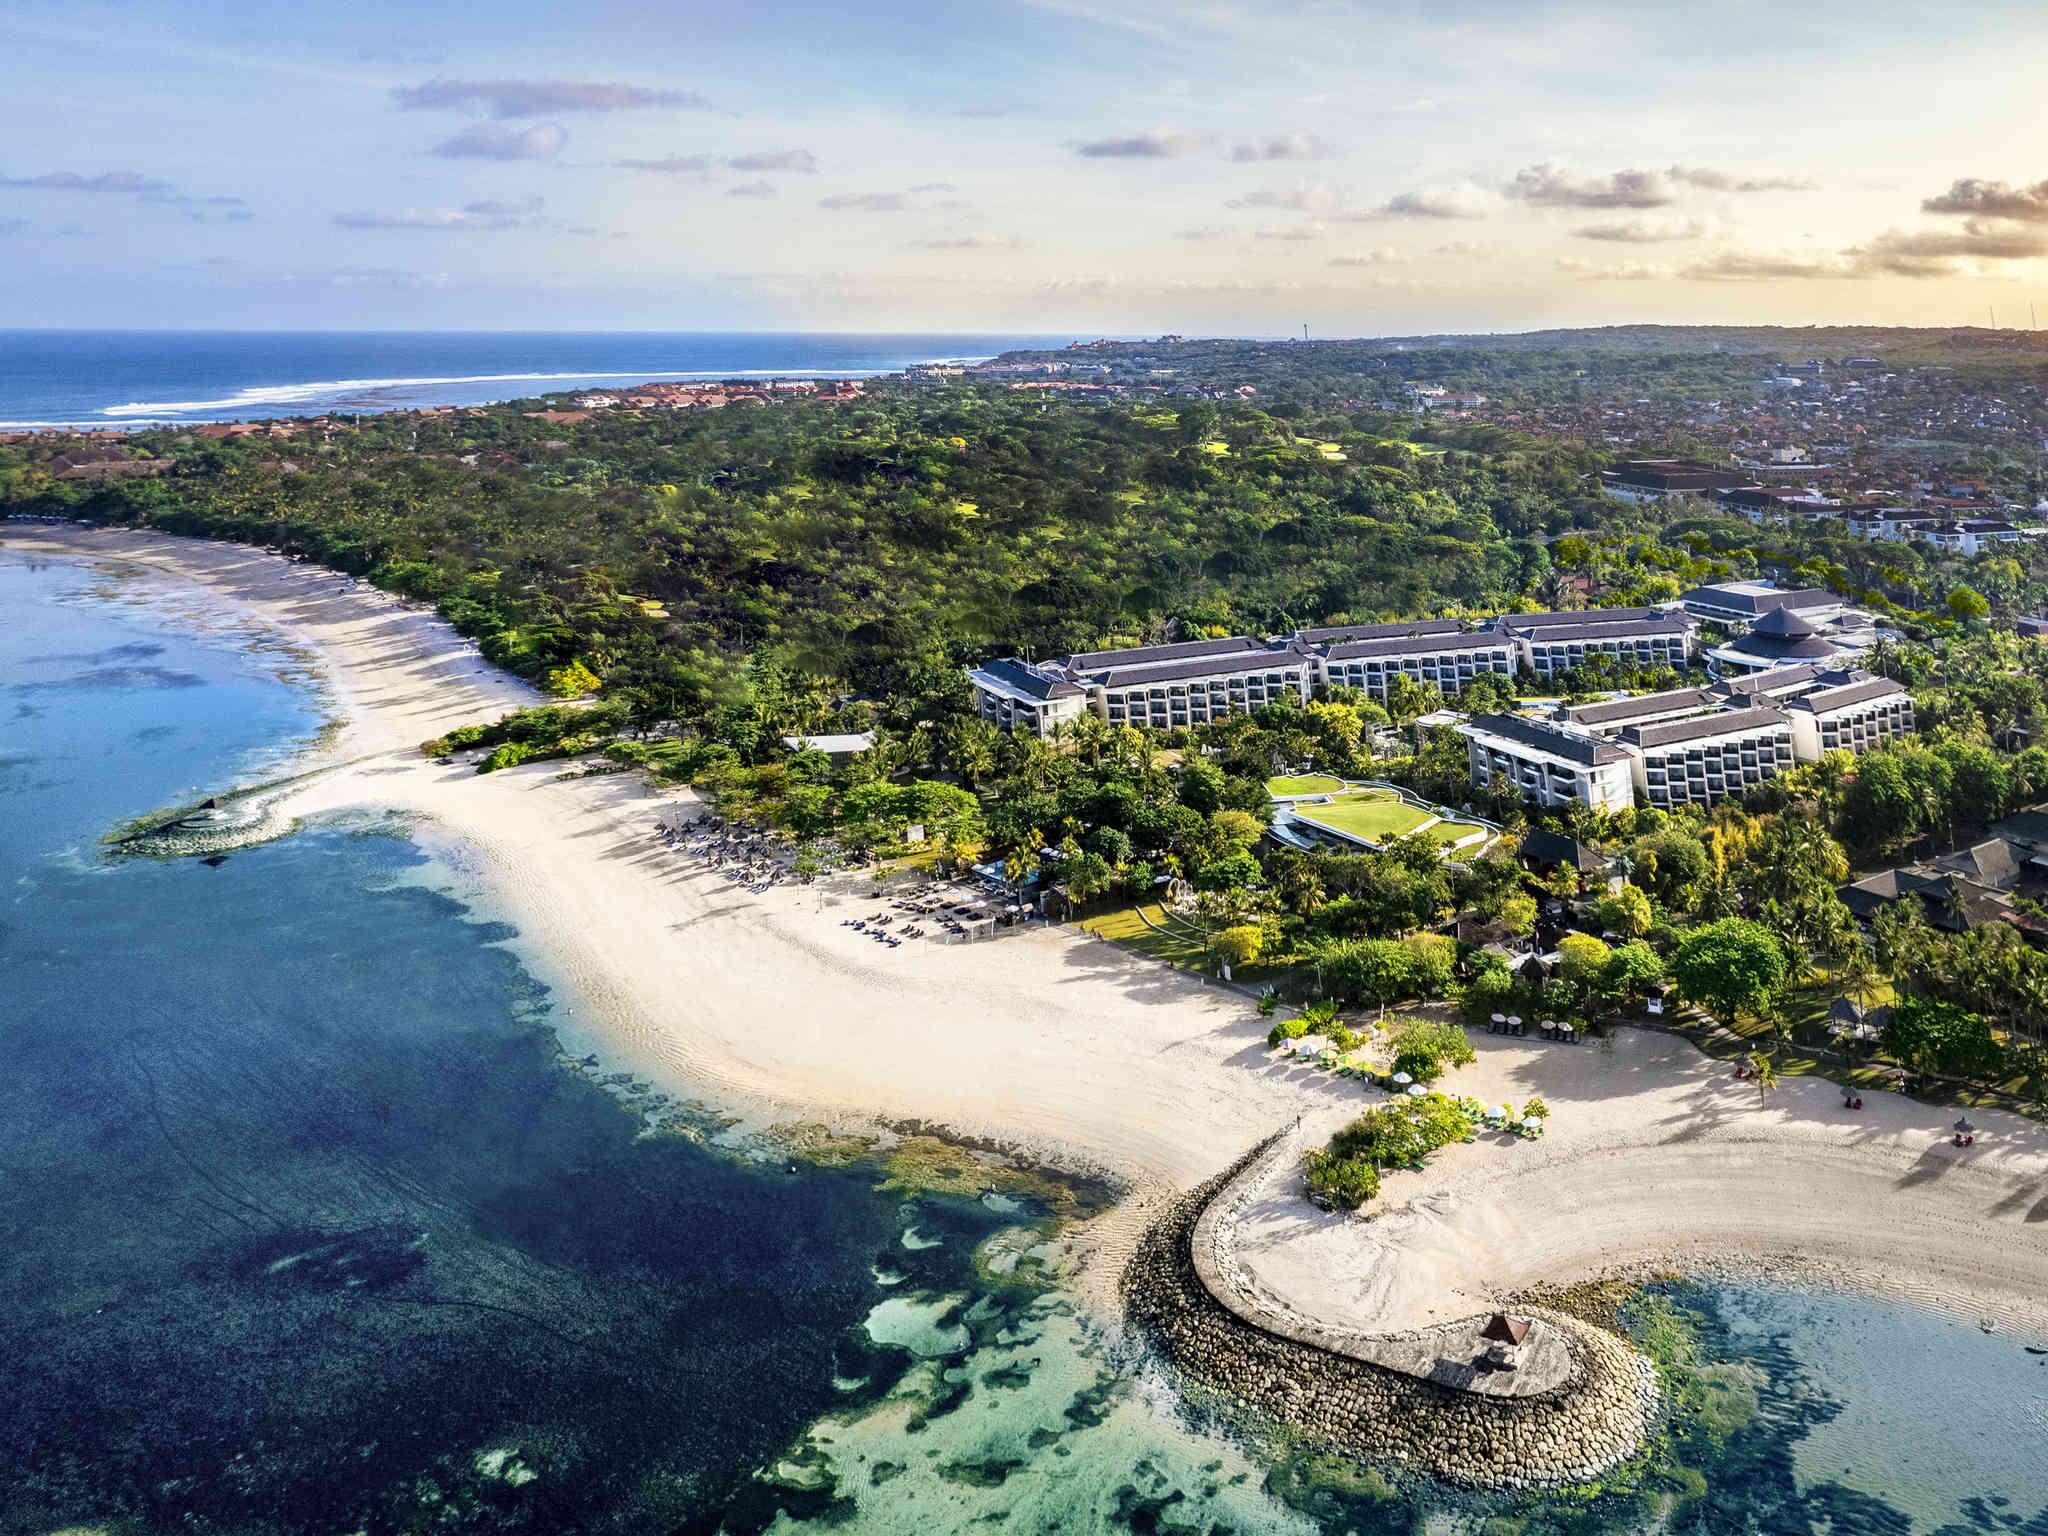 Sofitel Bali Nusa Dua Beach Resort Luxury Accorhotels Voucher Fashion Hotel By The Trans Bintang 4